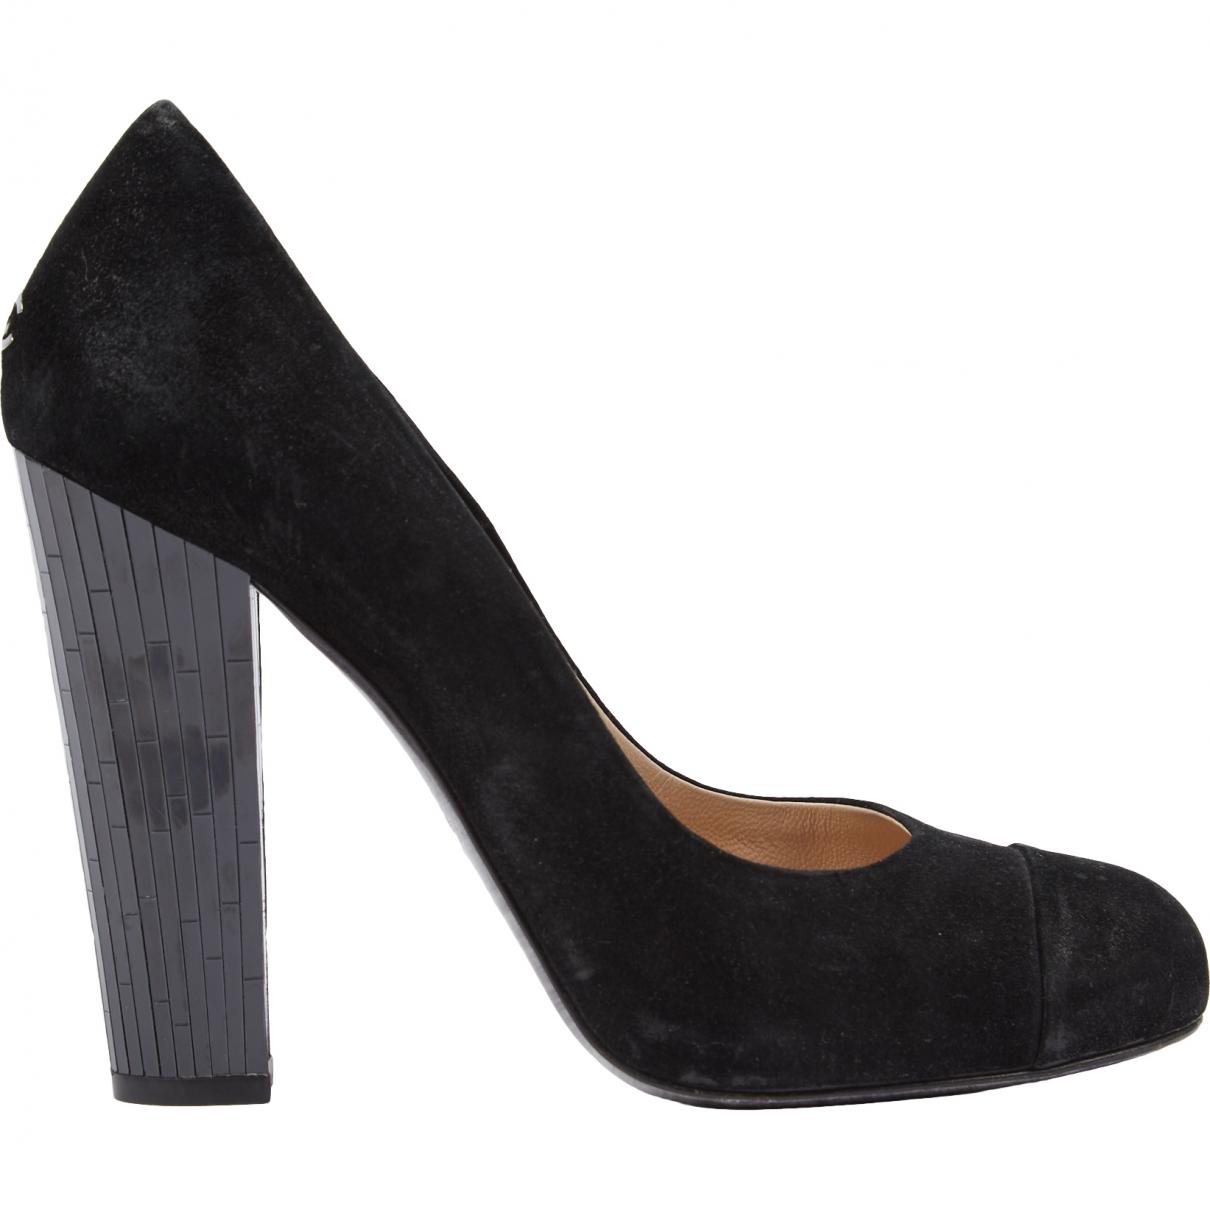 Chanel \N Black Suede Heels for Women 40.5 EU